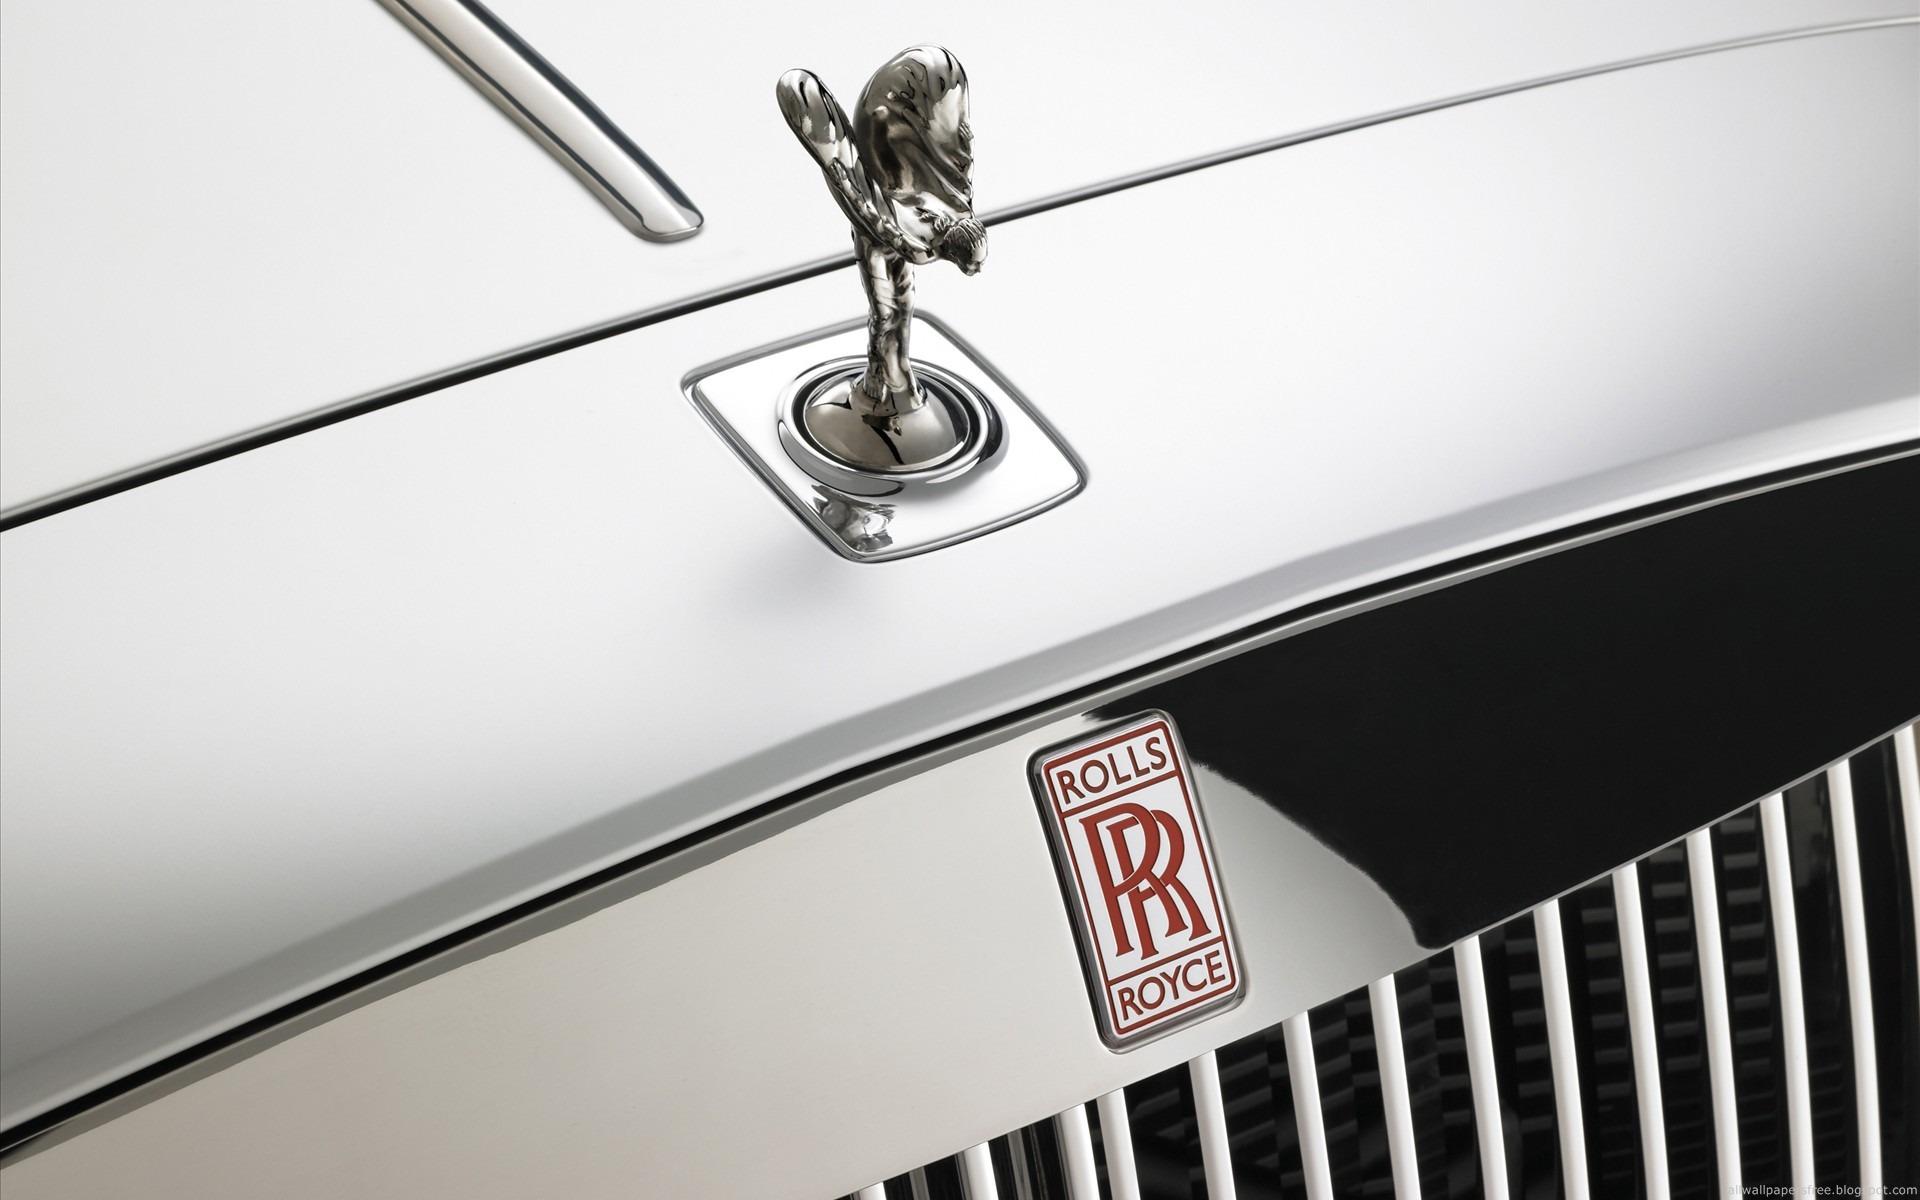 How a Rolls Royce Phantom is made